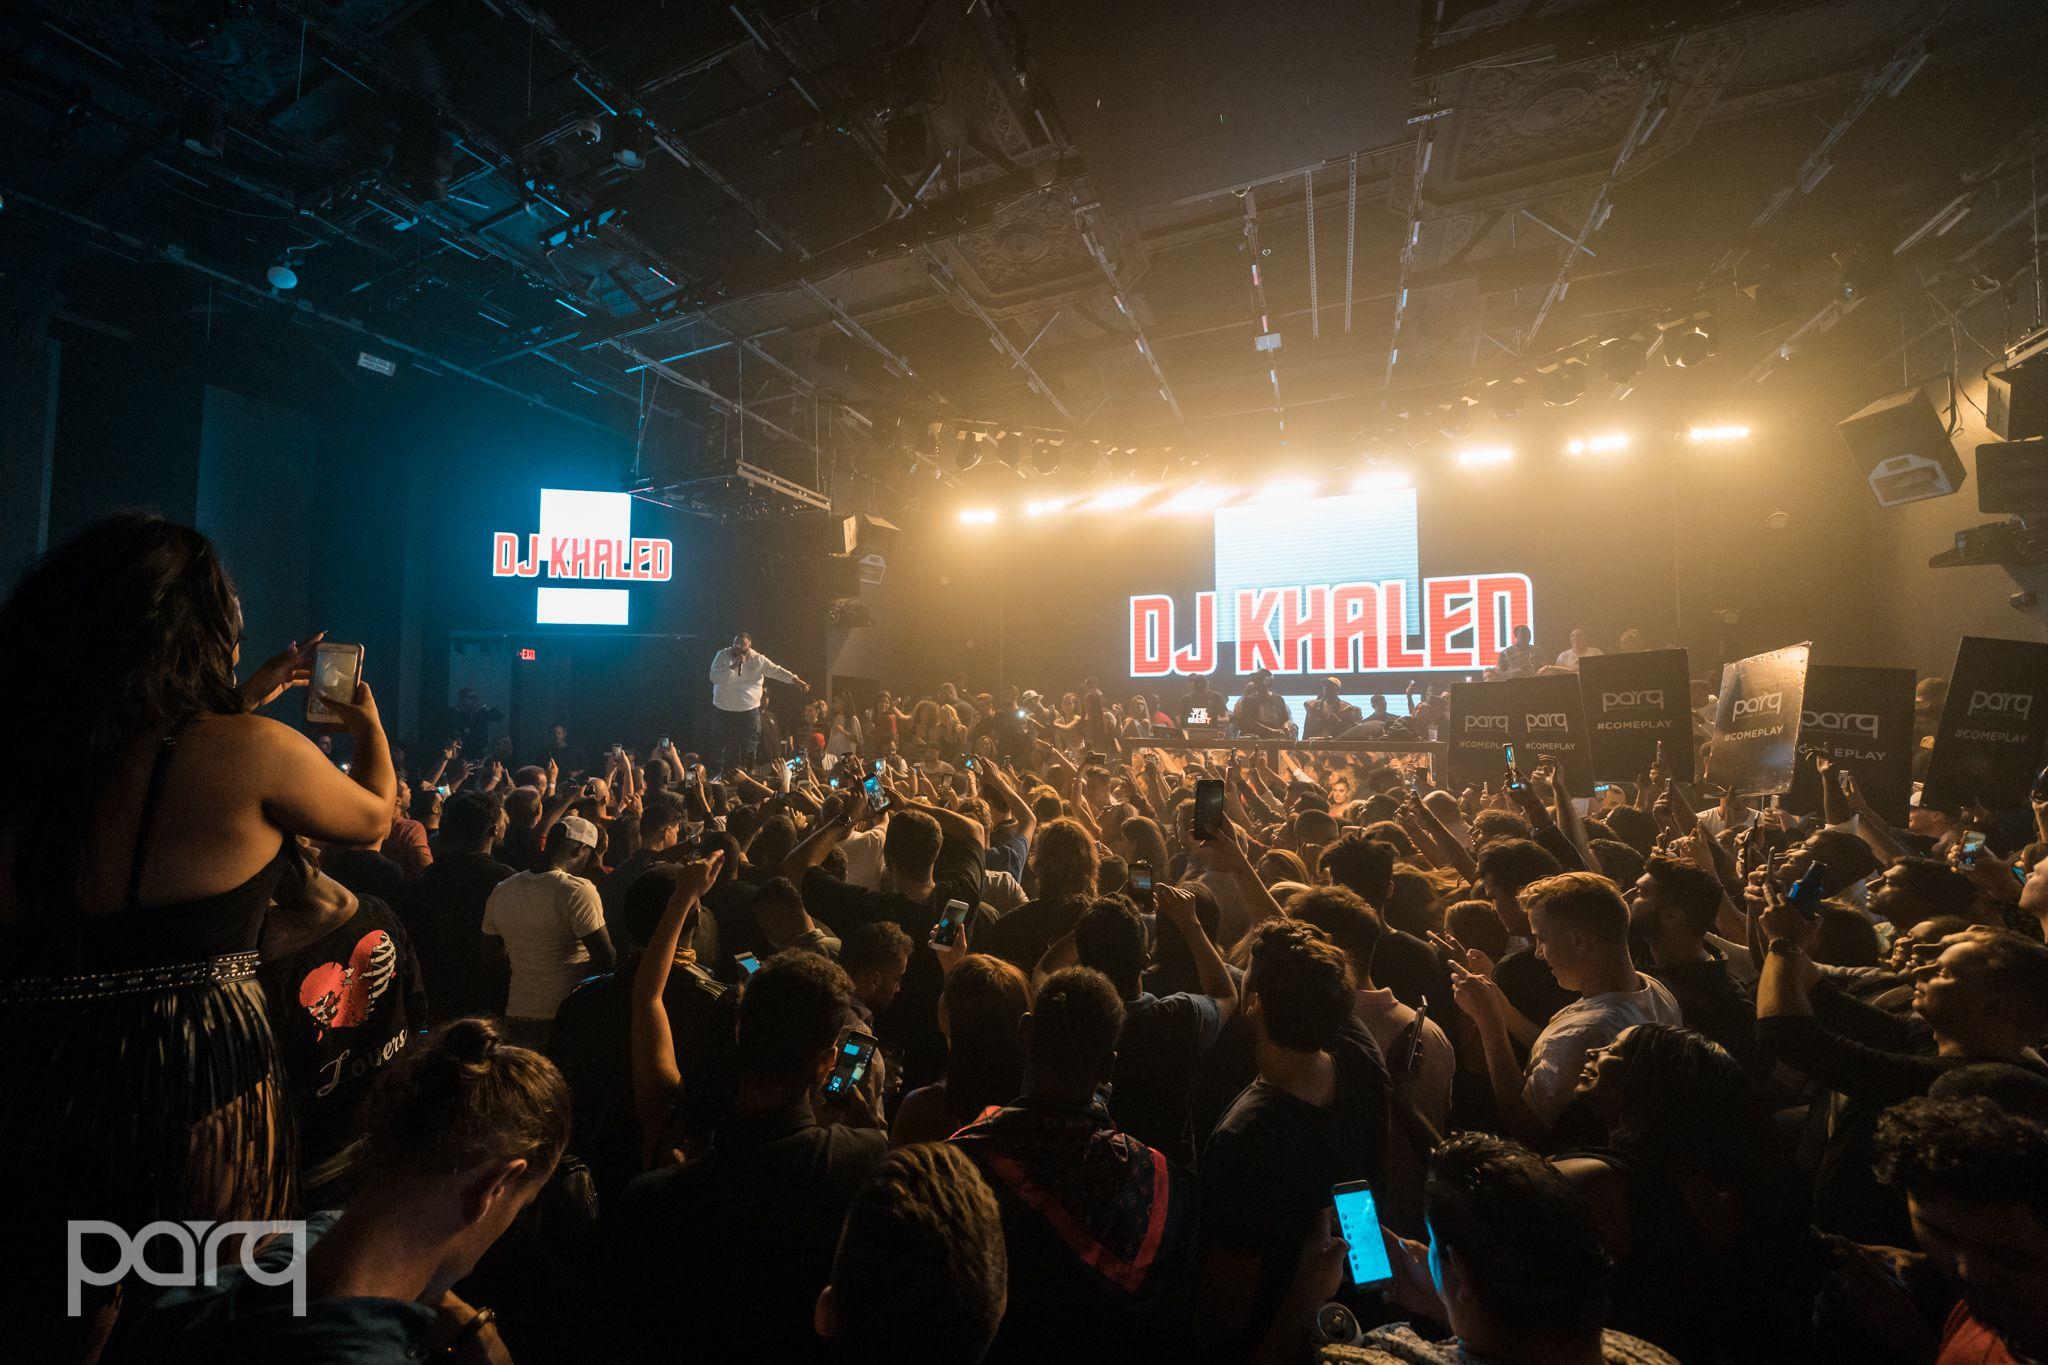 09.27.18 Parq - DJ Khaled-1.jpg